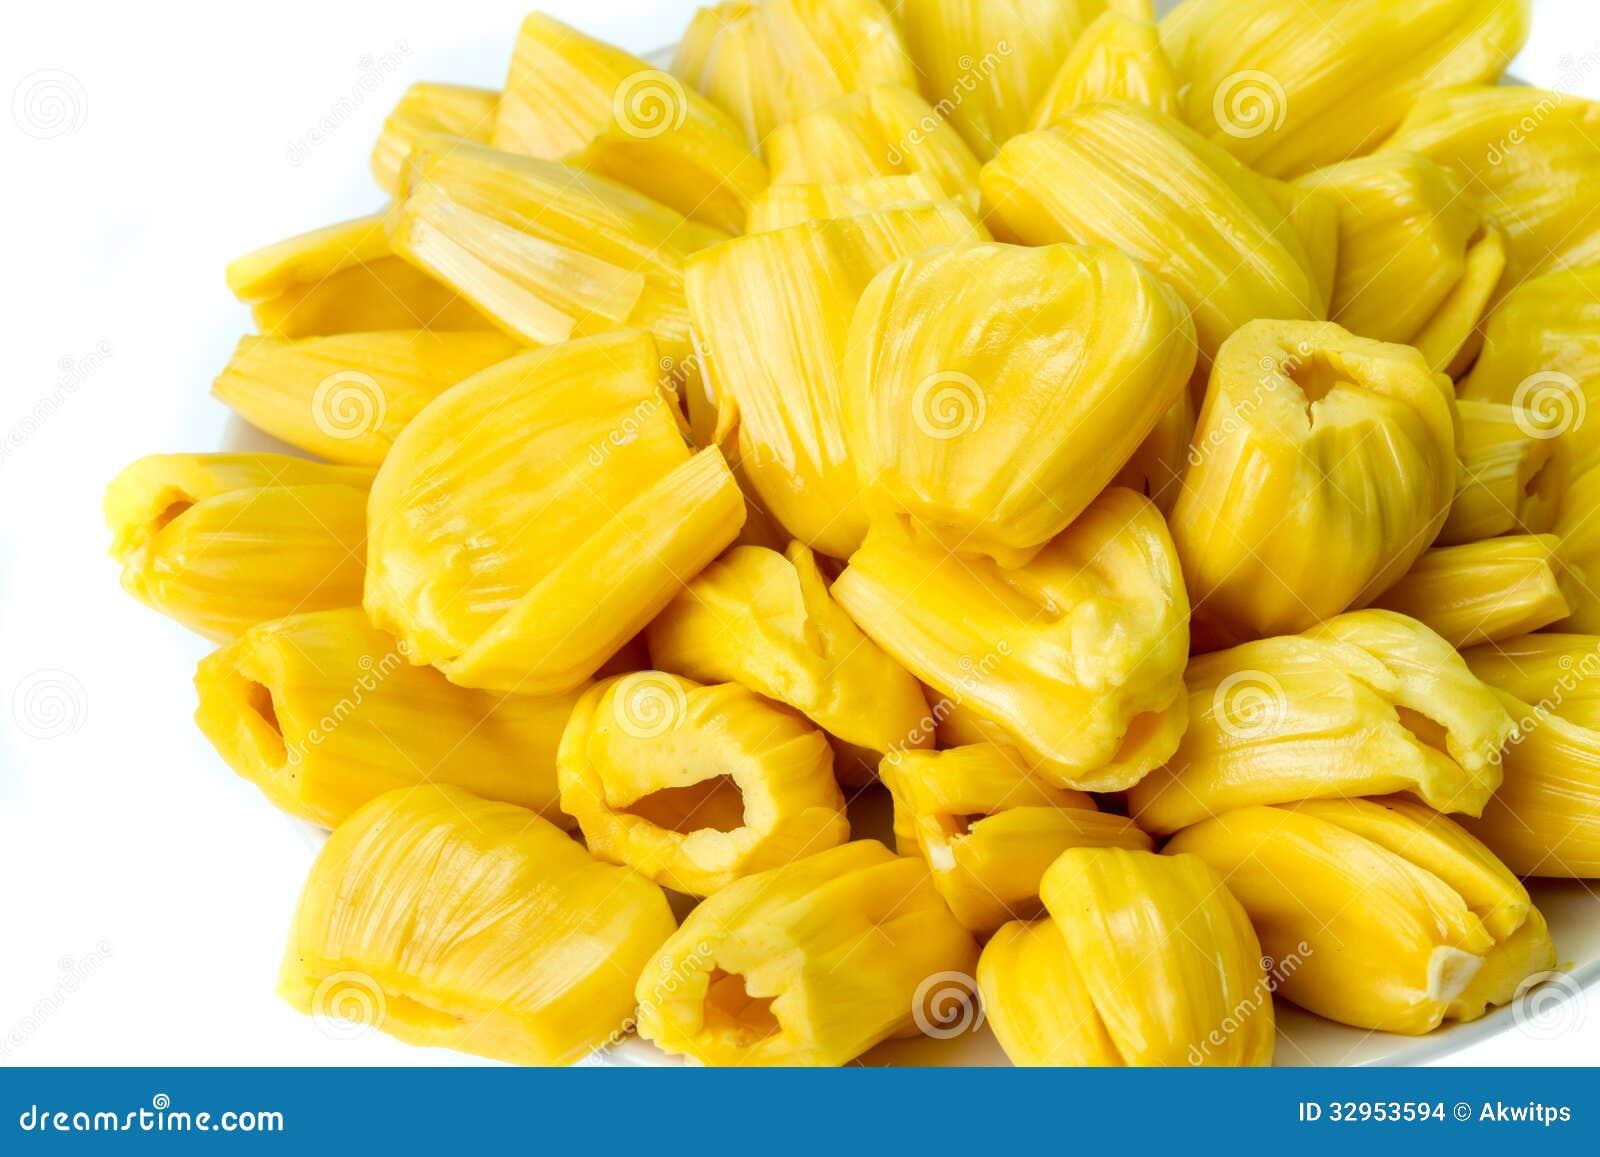 ripe jackfruit stock images  image, Beautiful flower